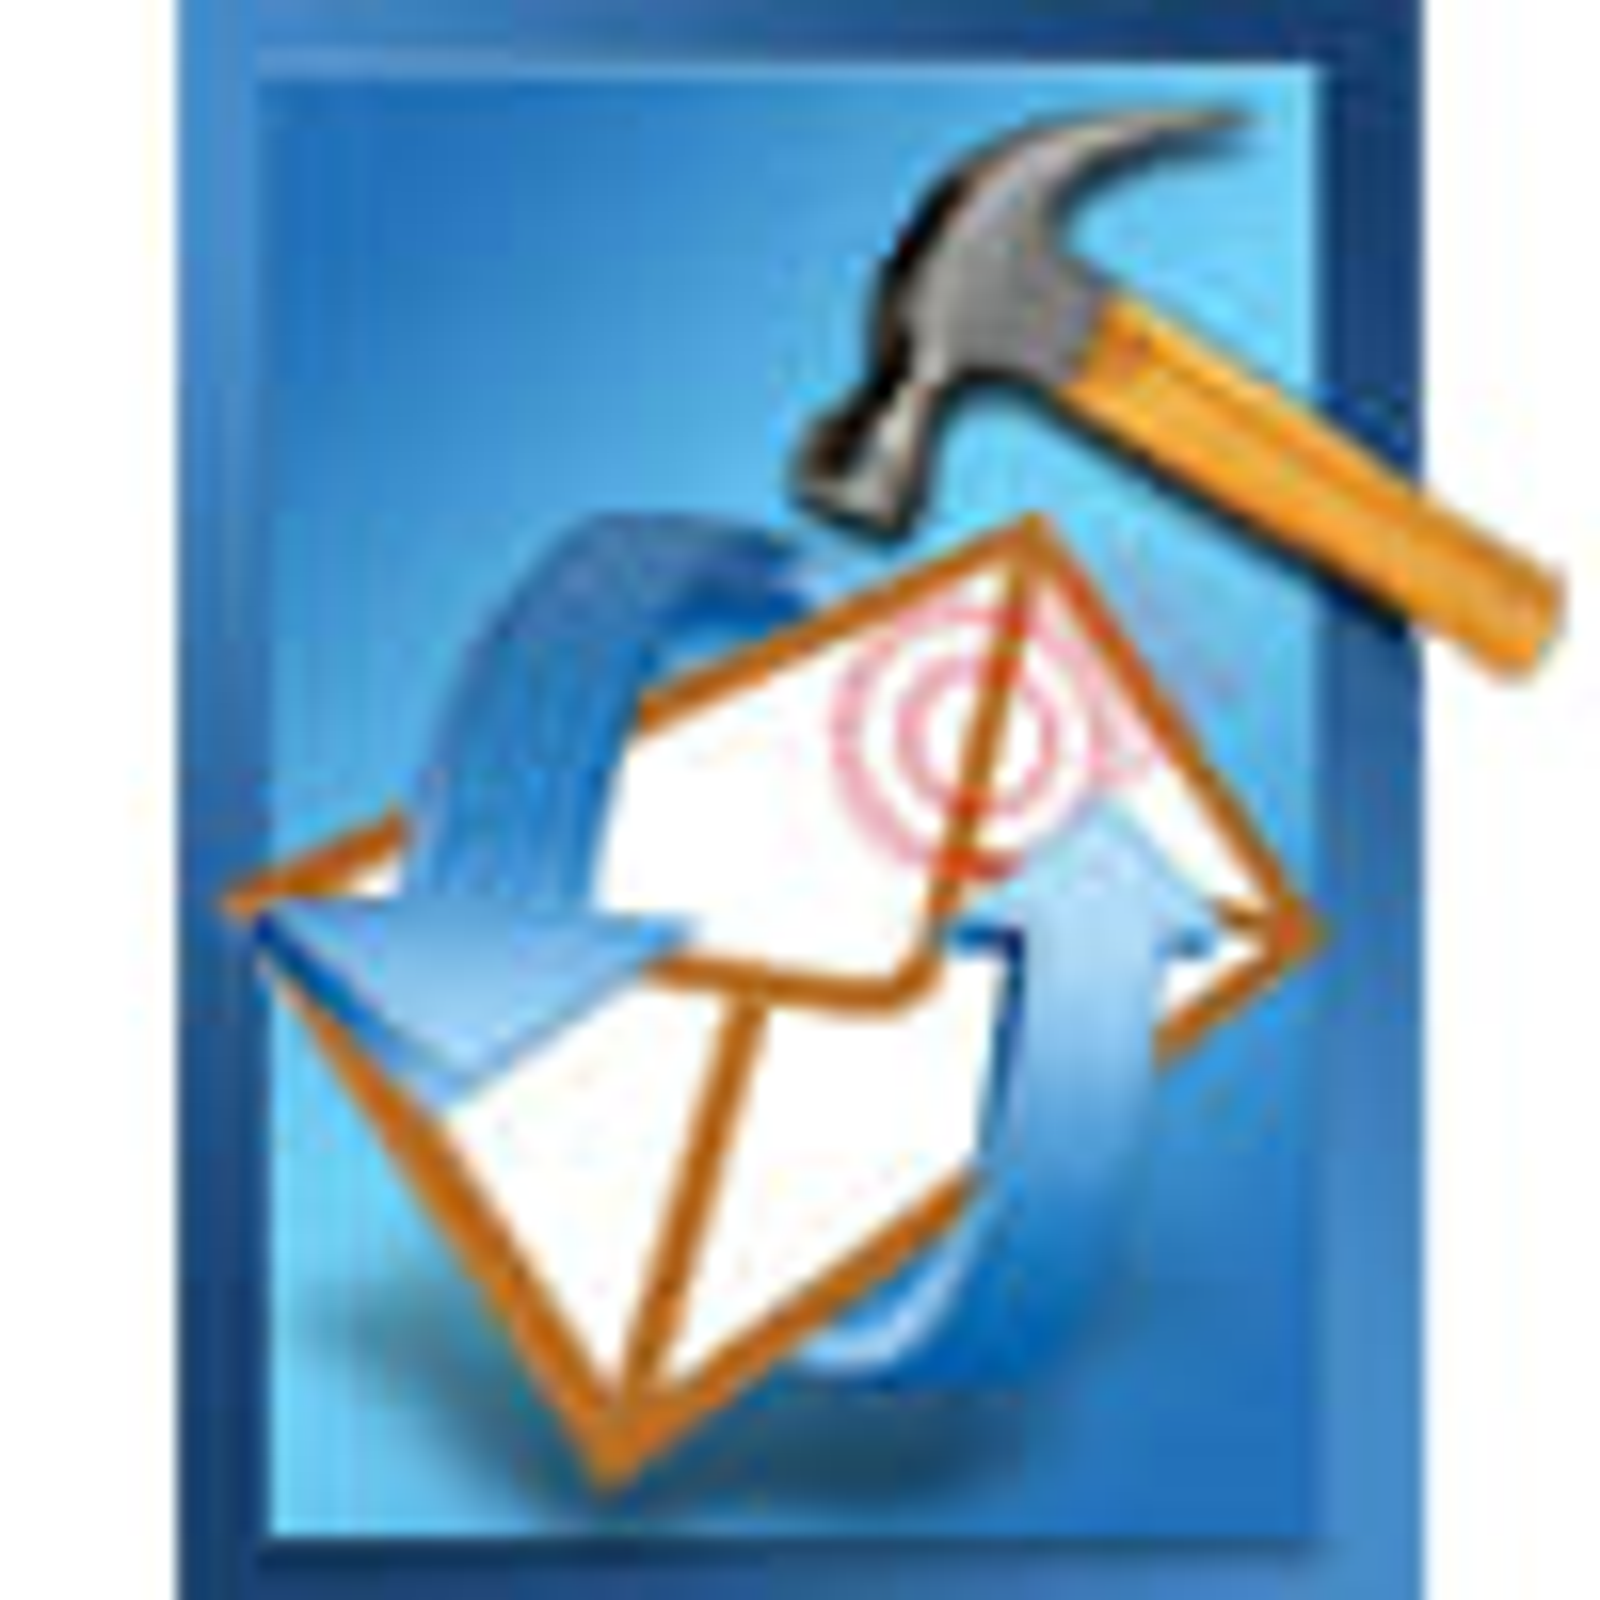 Stellar Phoenix Outlook Express Repair